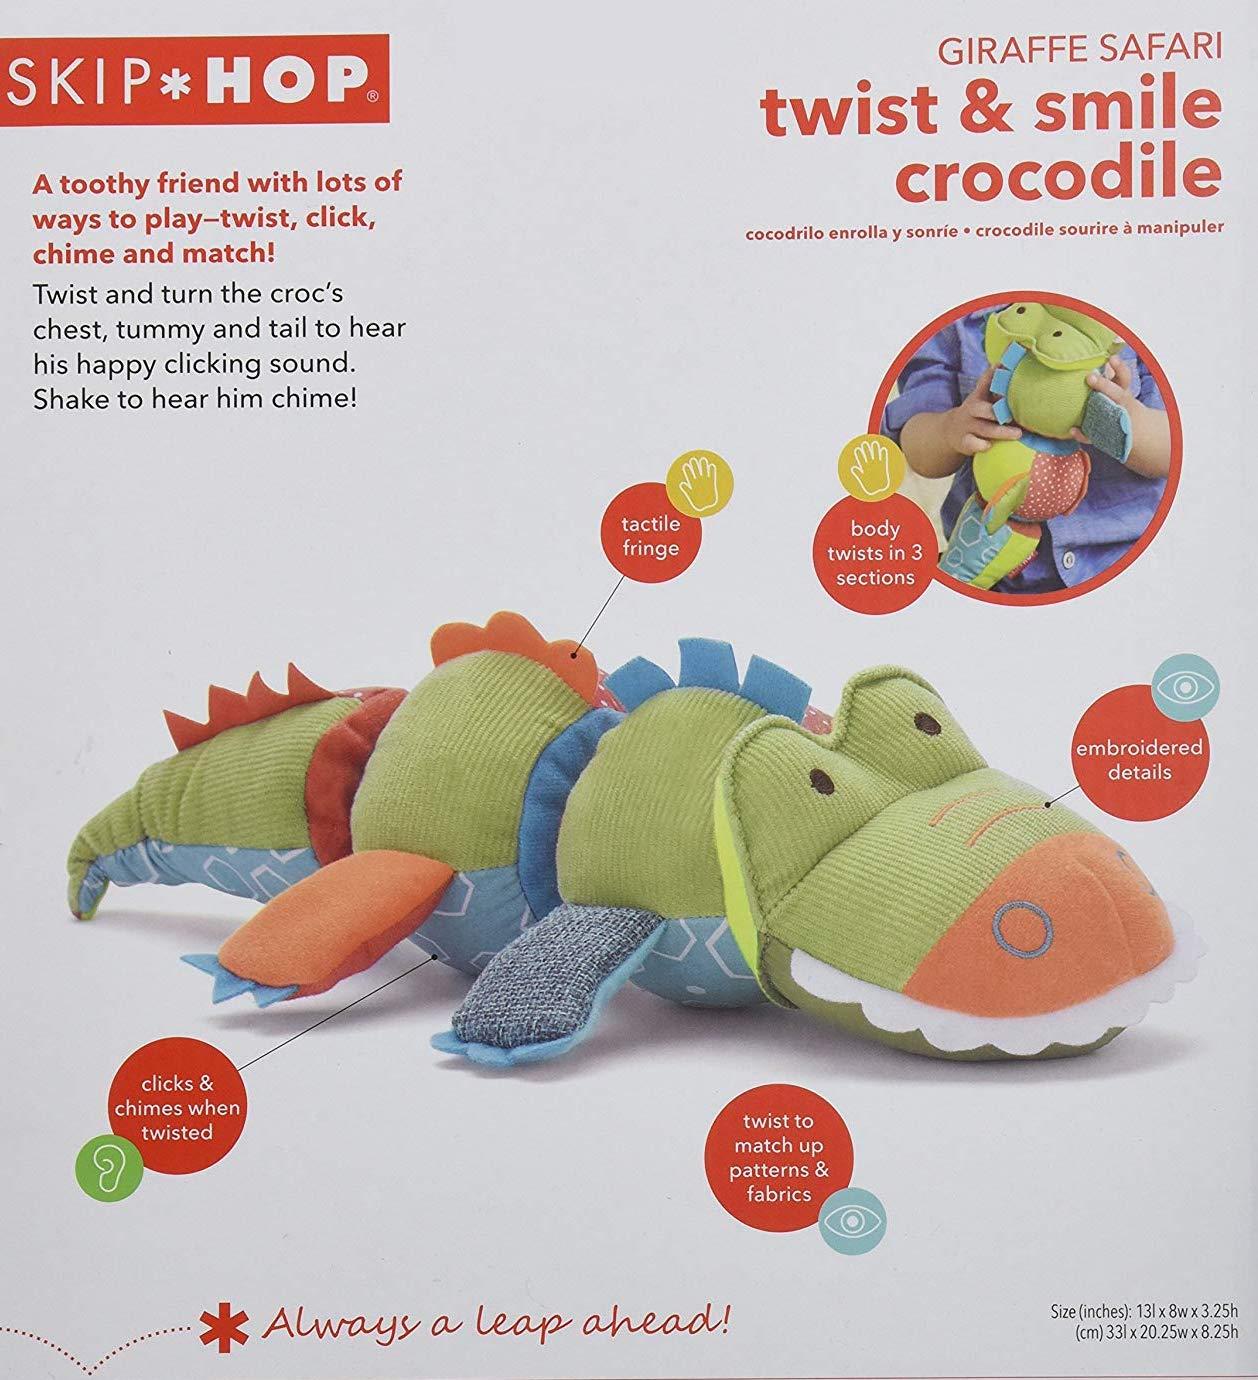 skip hop twist and smile soft toys crocodile 宝宝软布偶